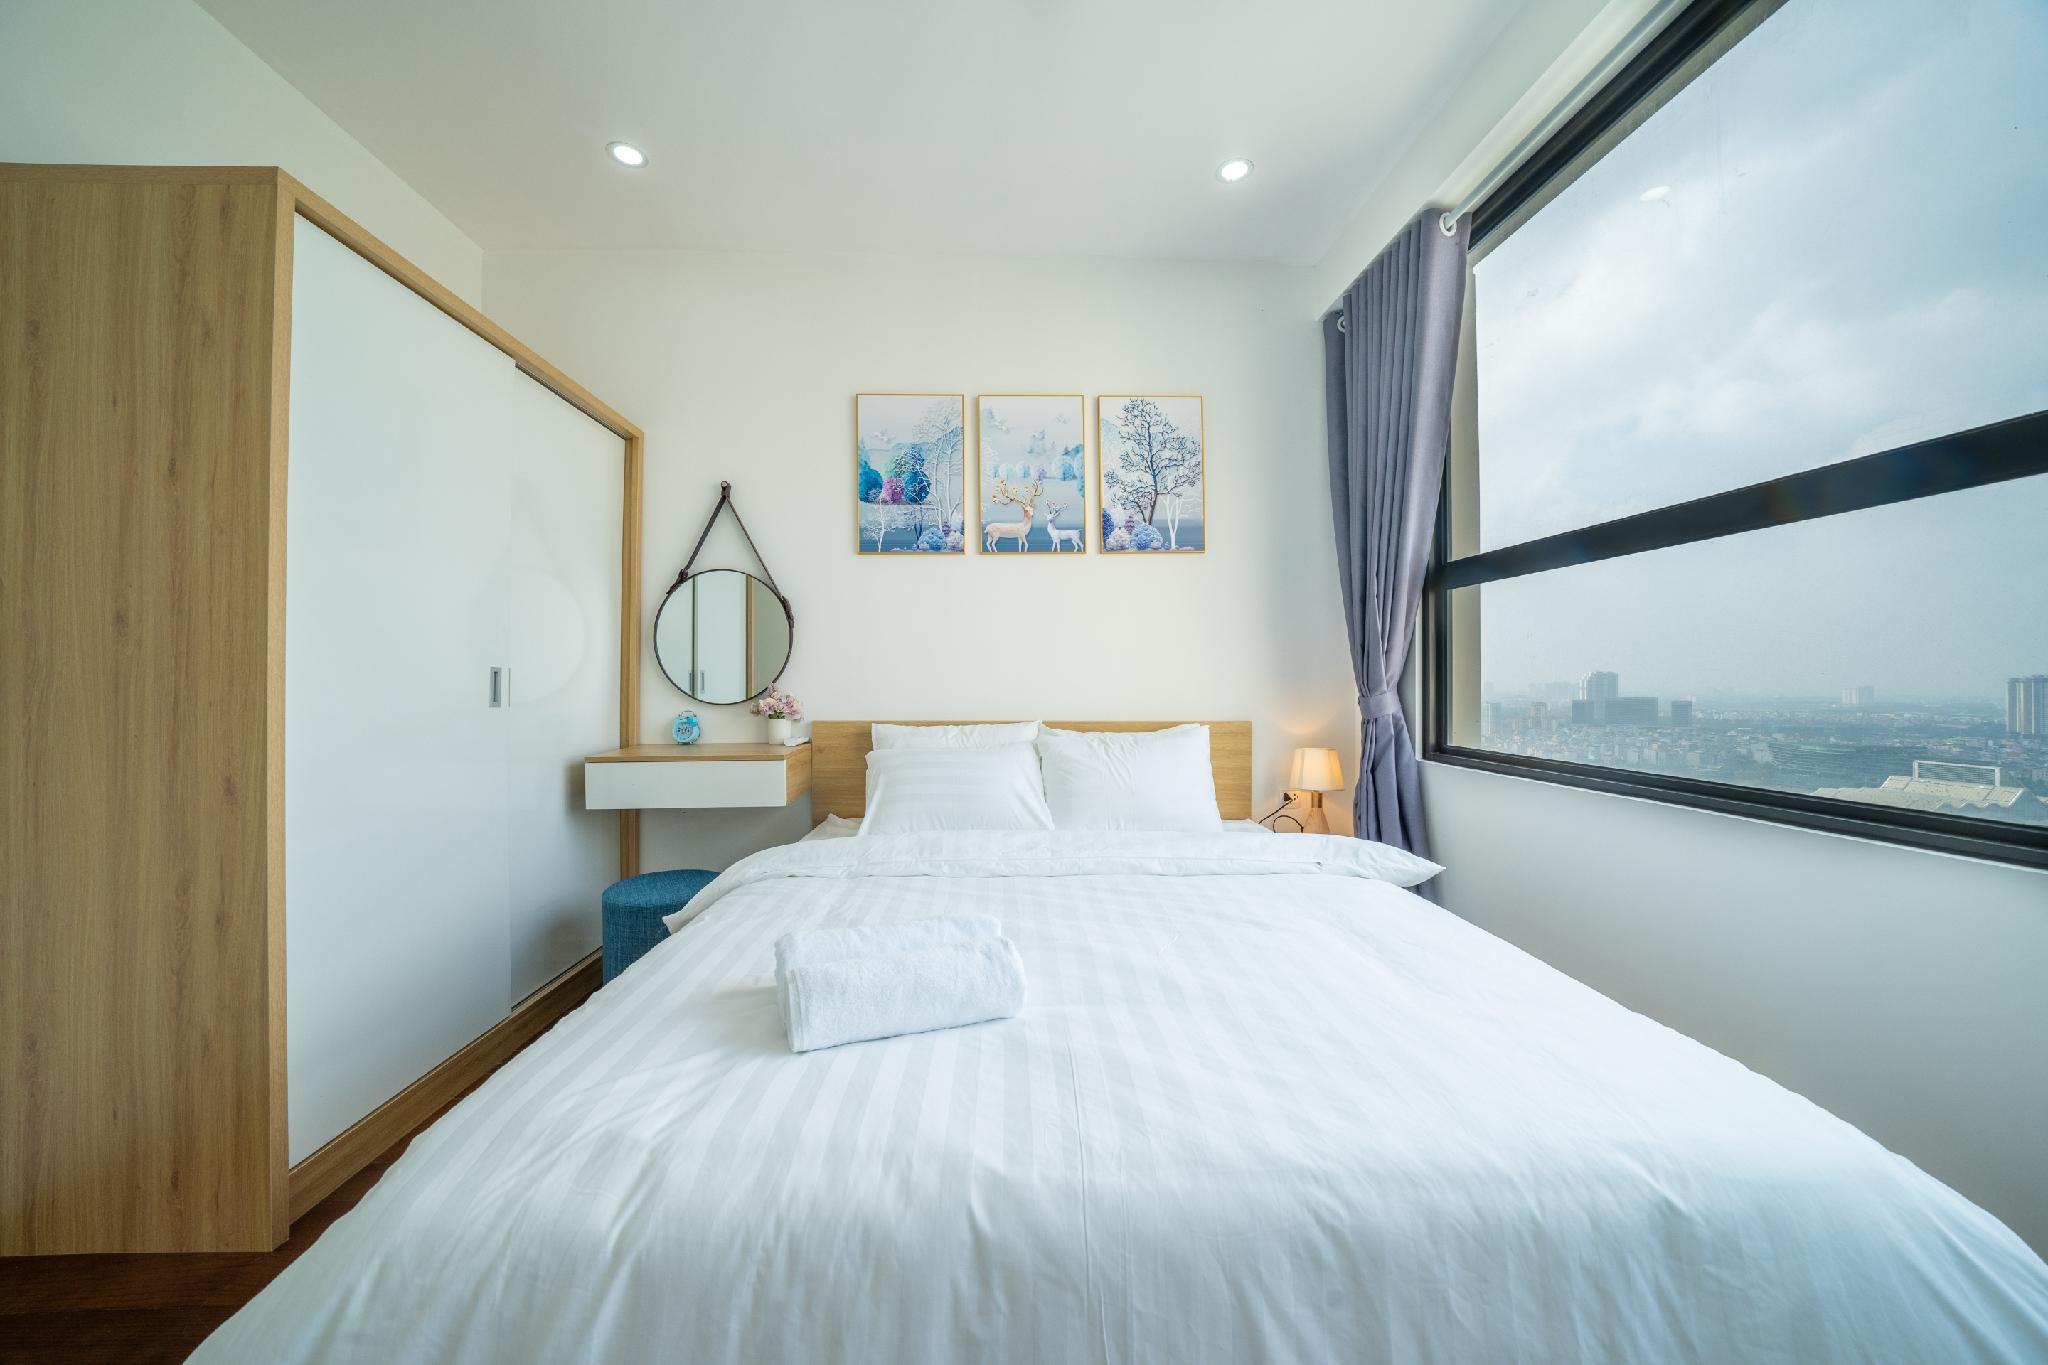 BI HOUSE 2 BEDROOMS @ CLEAN@ NICE VIEW @ COZY